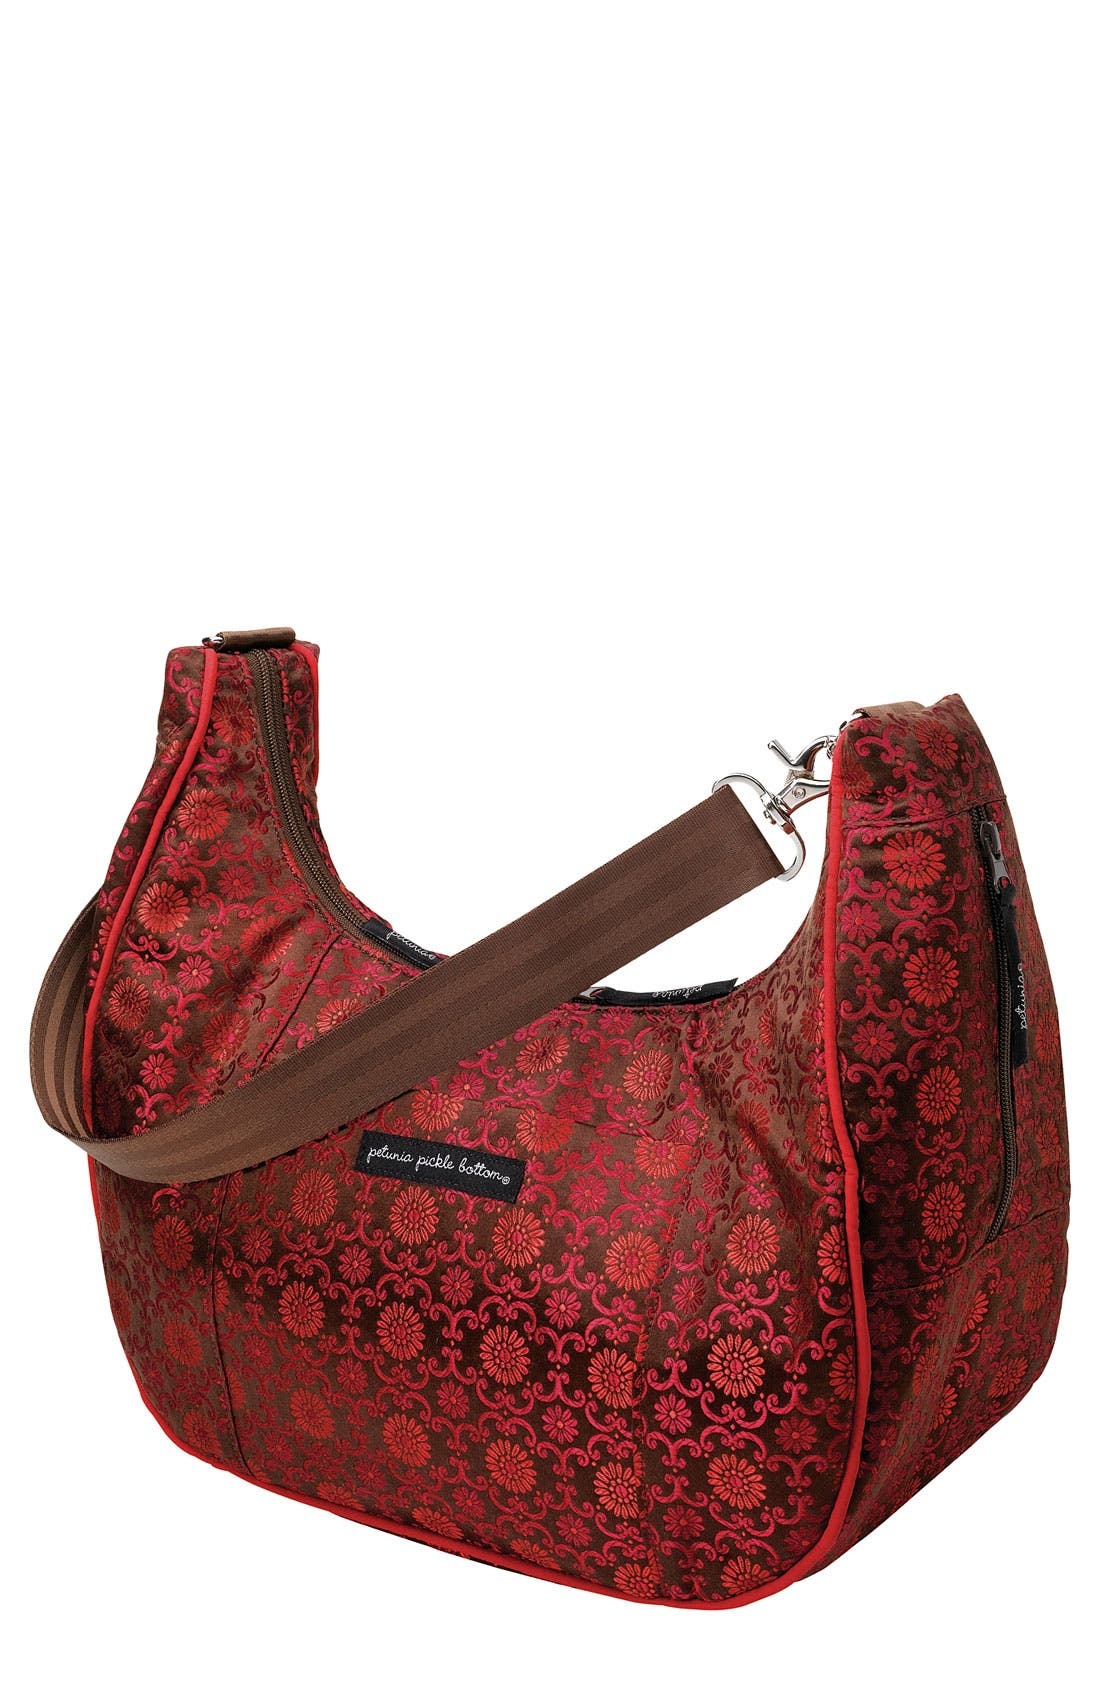 Main Image - Petunia Pickle Bottom 'Touring Tote' Glazed Diaper Bag